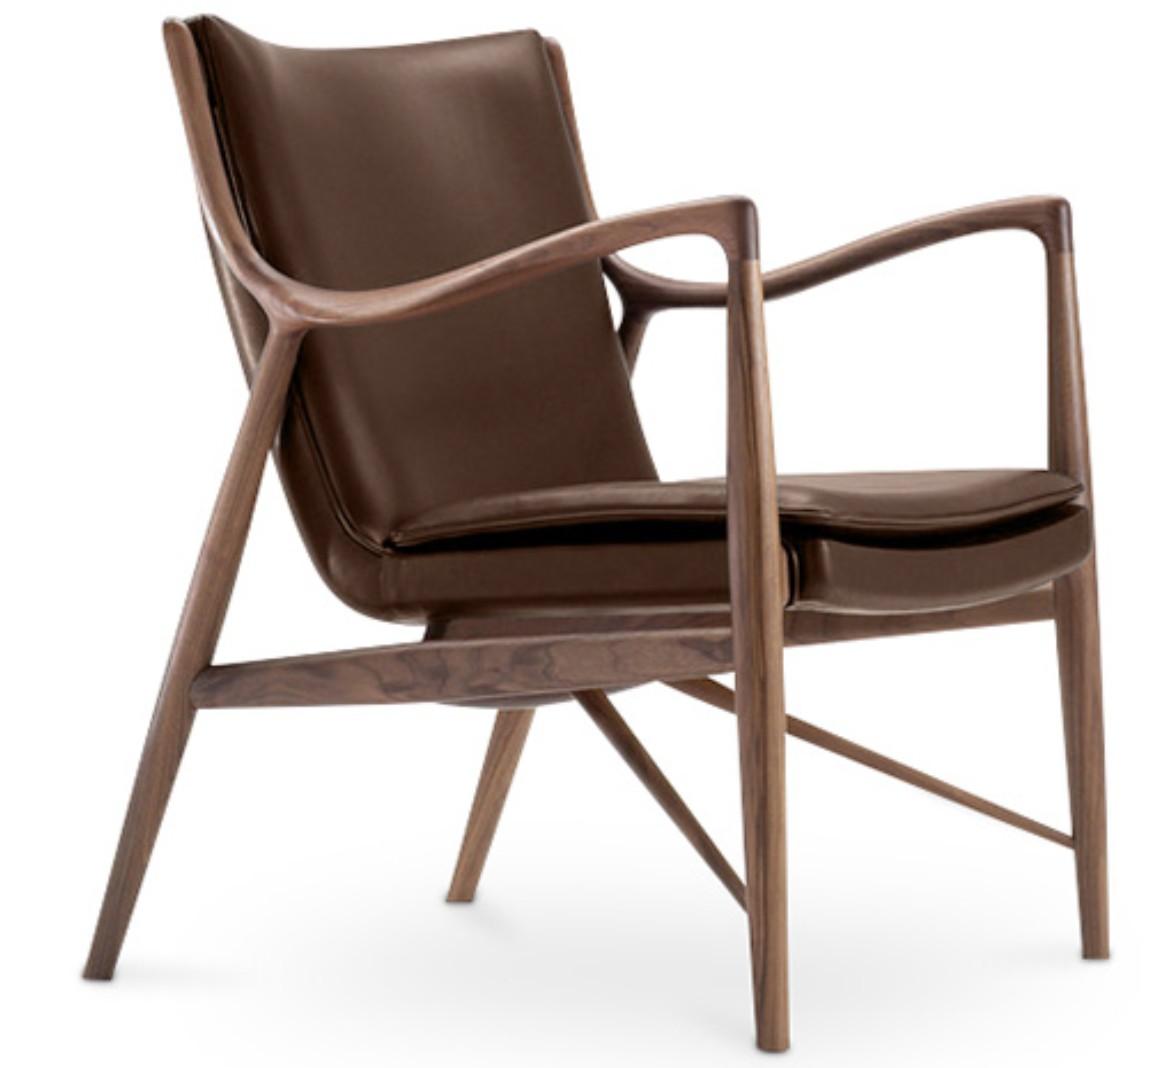 fauteuil original bois et cuir marron fonc inspir finn. Black Bedroom Furniture Sets. Home Design Ideas